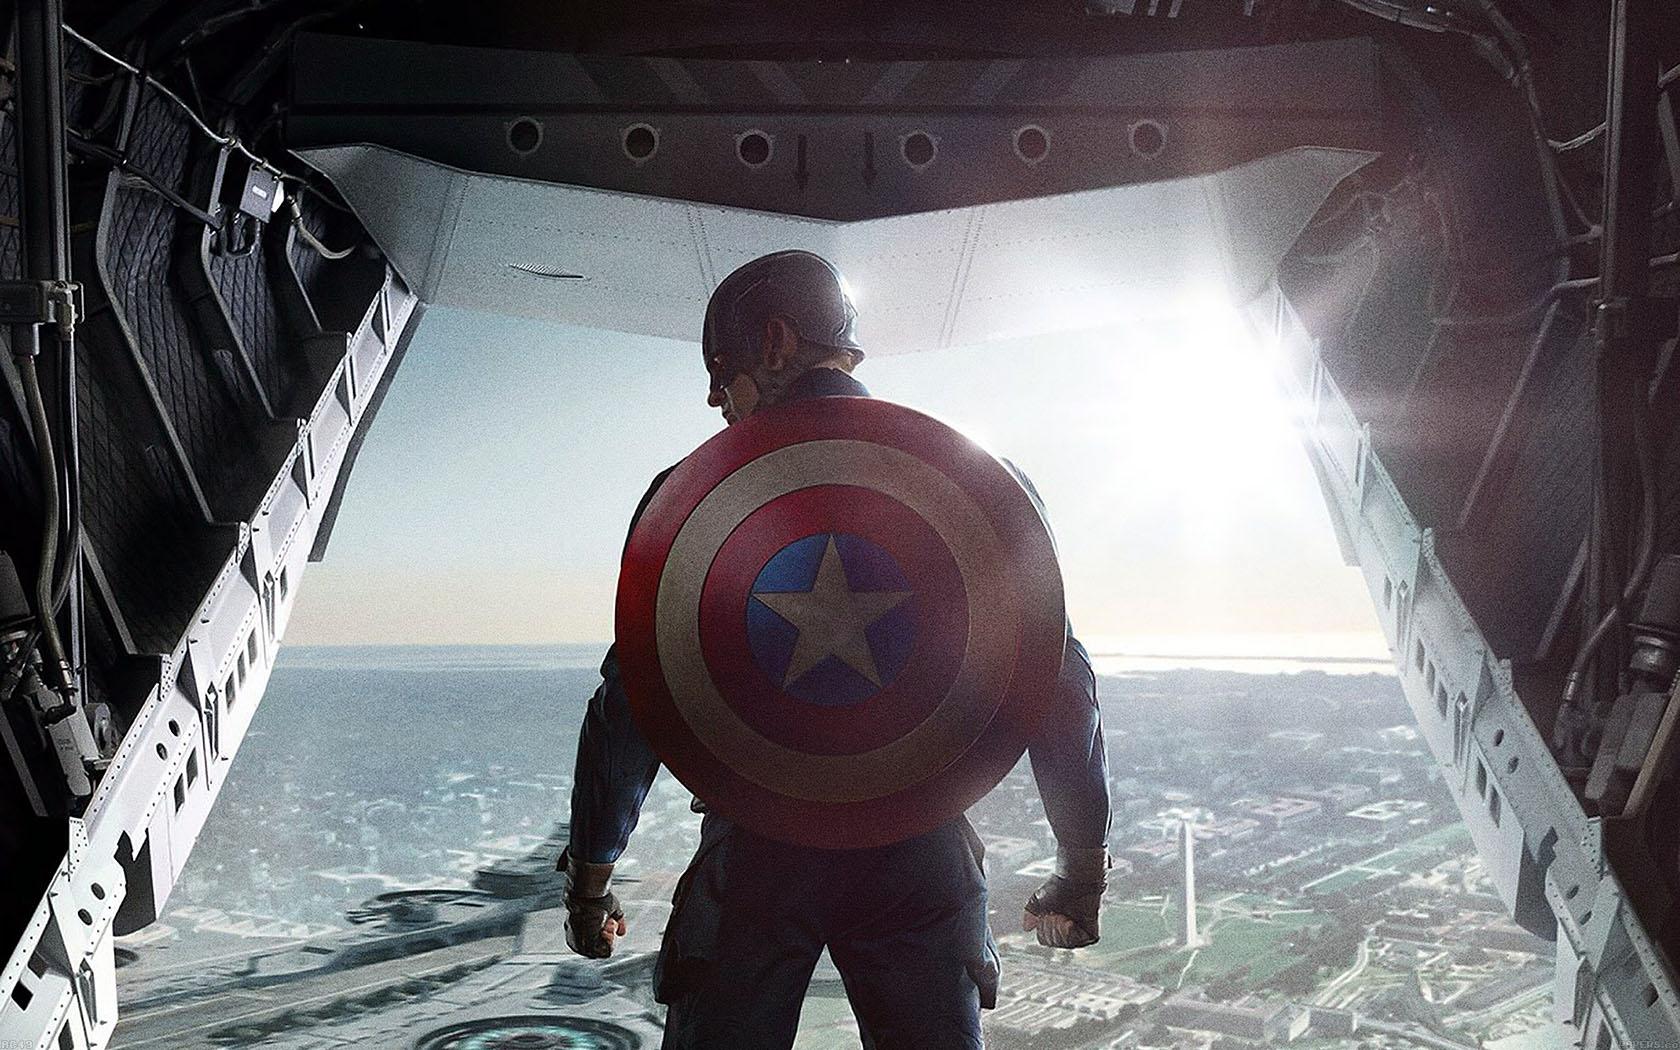 ac49-wallpaper-captain-america-soldier-face-film-hero ...